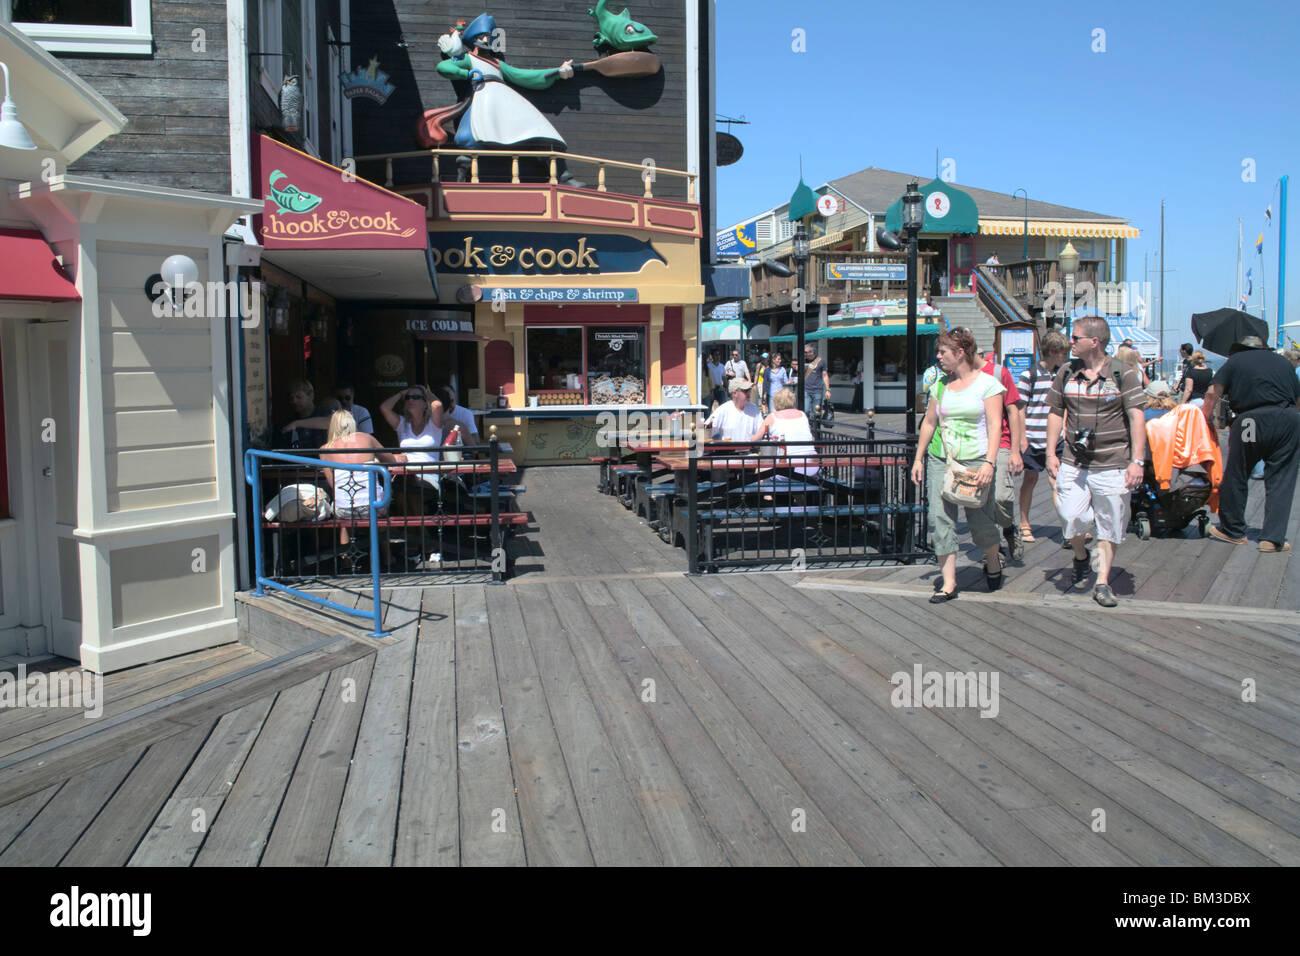 Seafood Restaurants On Fisherman S Wharf In San Francisco